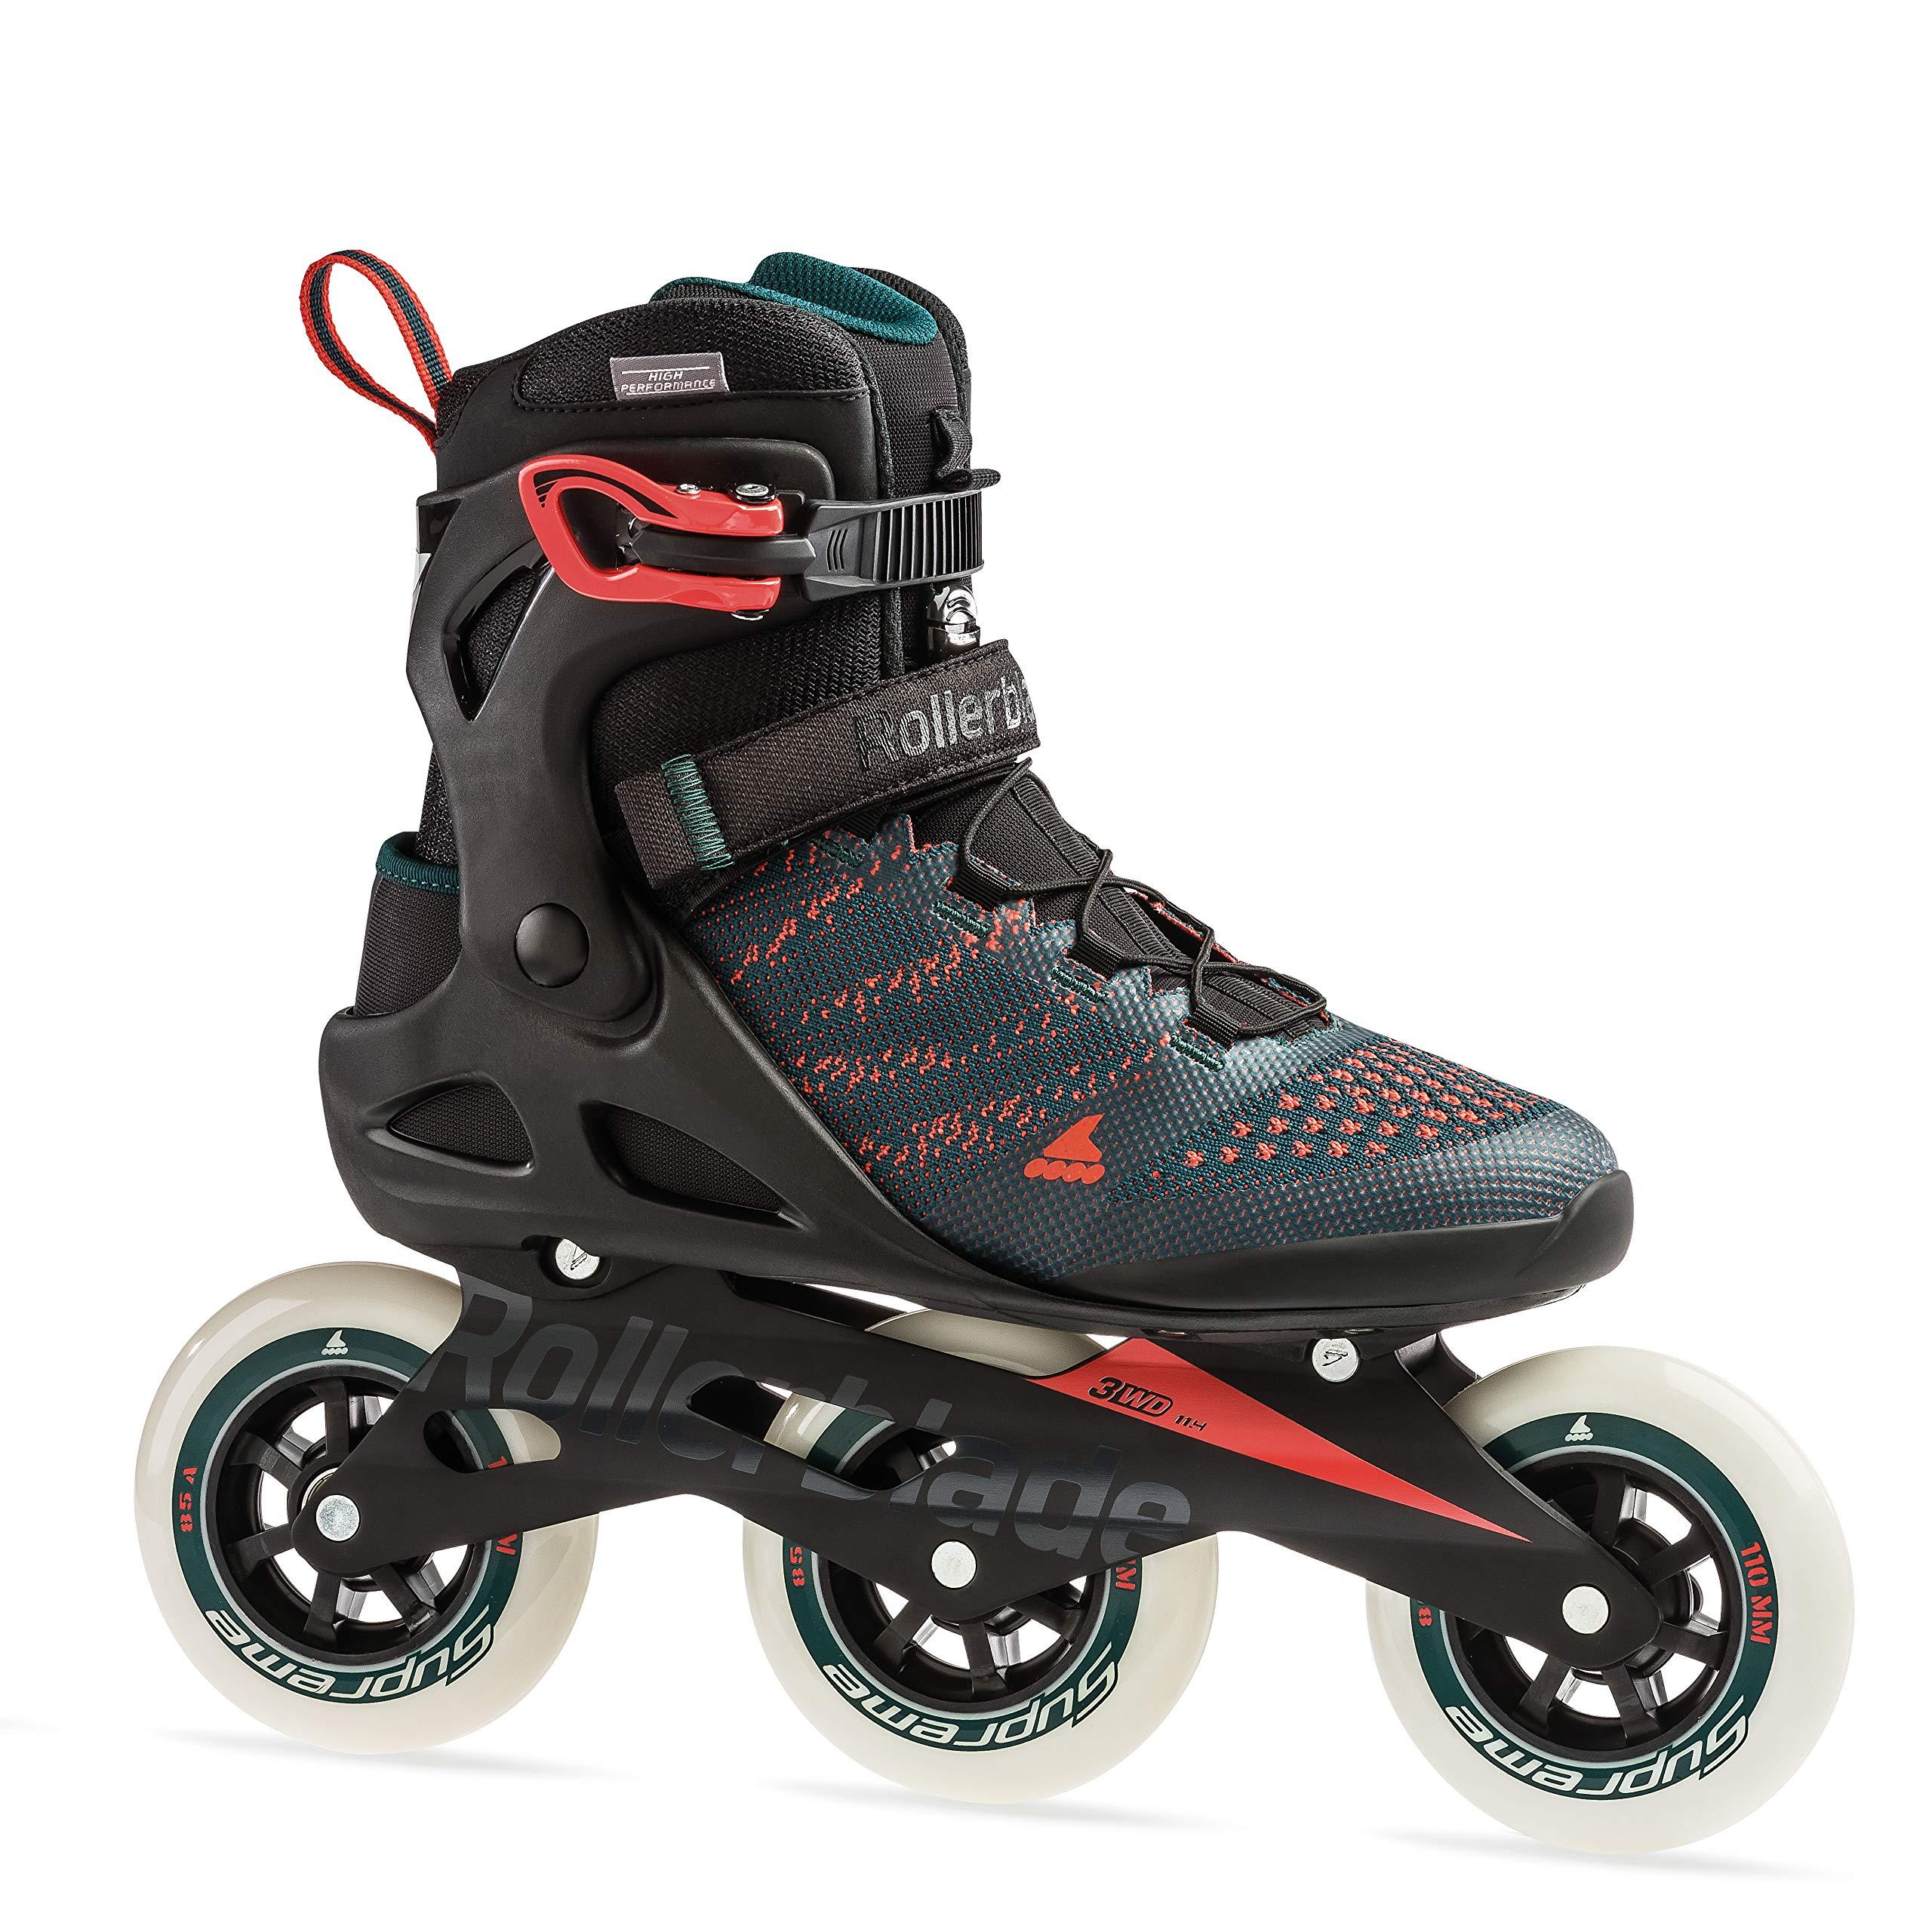 Rollerblade Macroblade 110 3Wd Men's Adult Fitness Inline Skate, Teal Green/Orange Burst, Medium 7.5